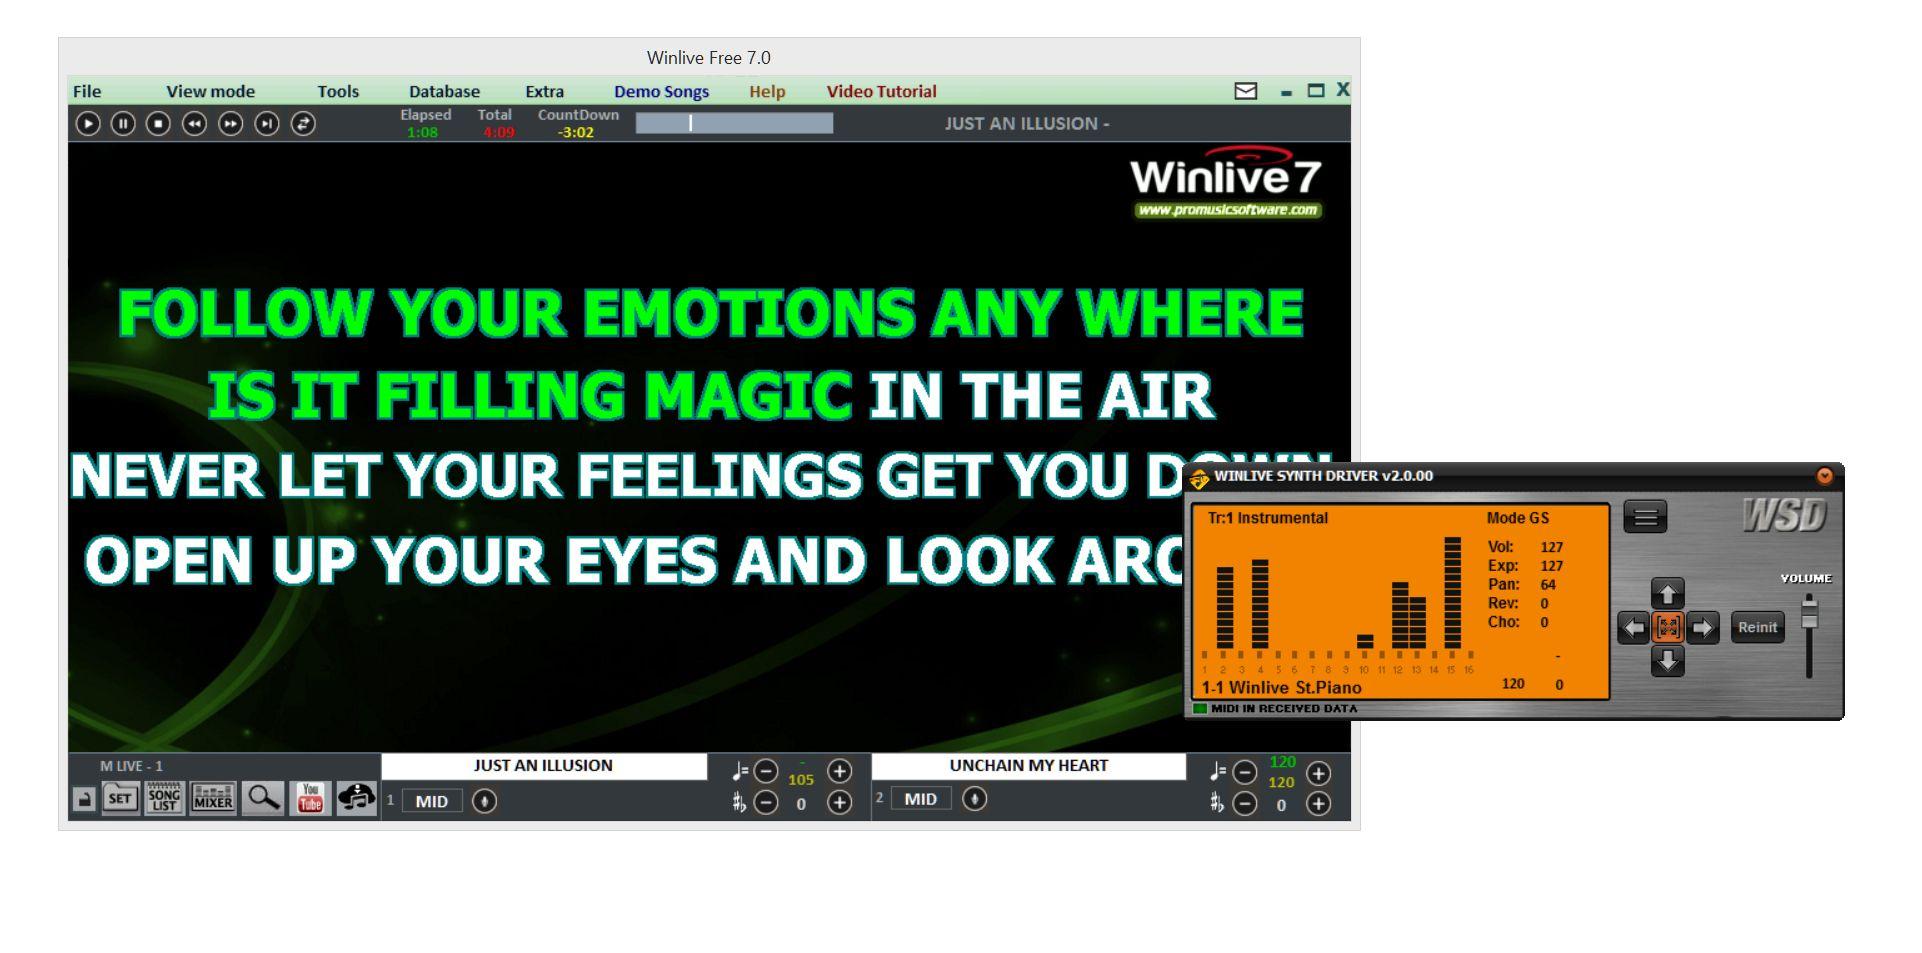 Vanbasco karaoke free download for windows 7 64 bit | ЕНТ